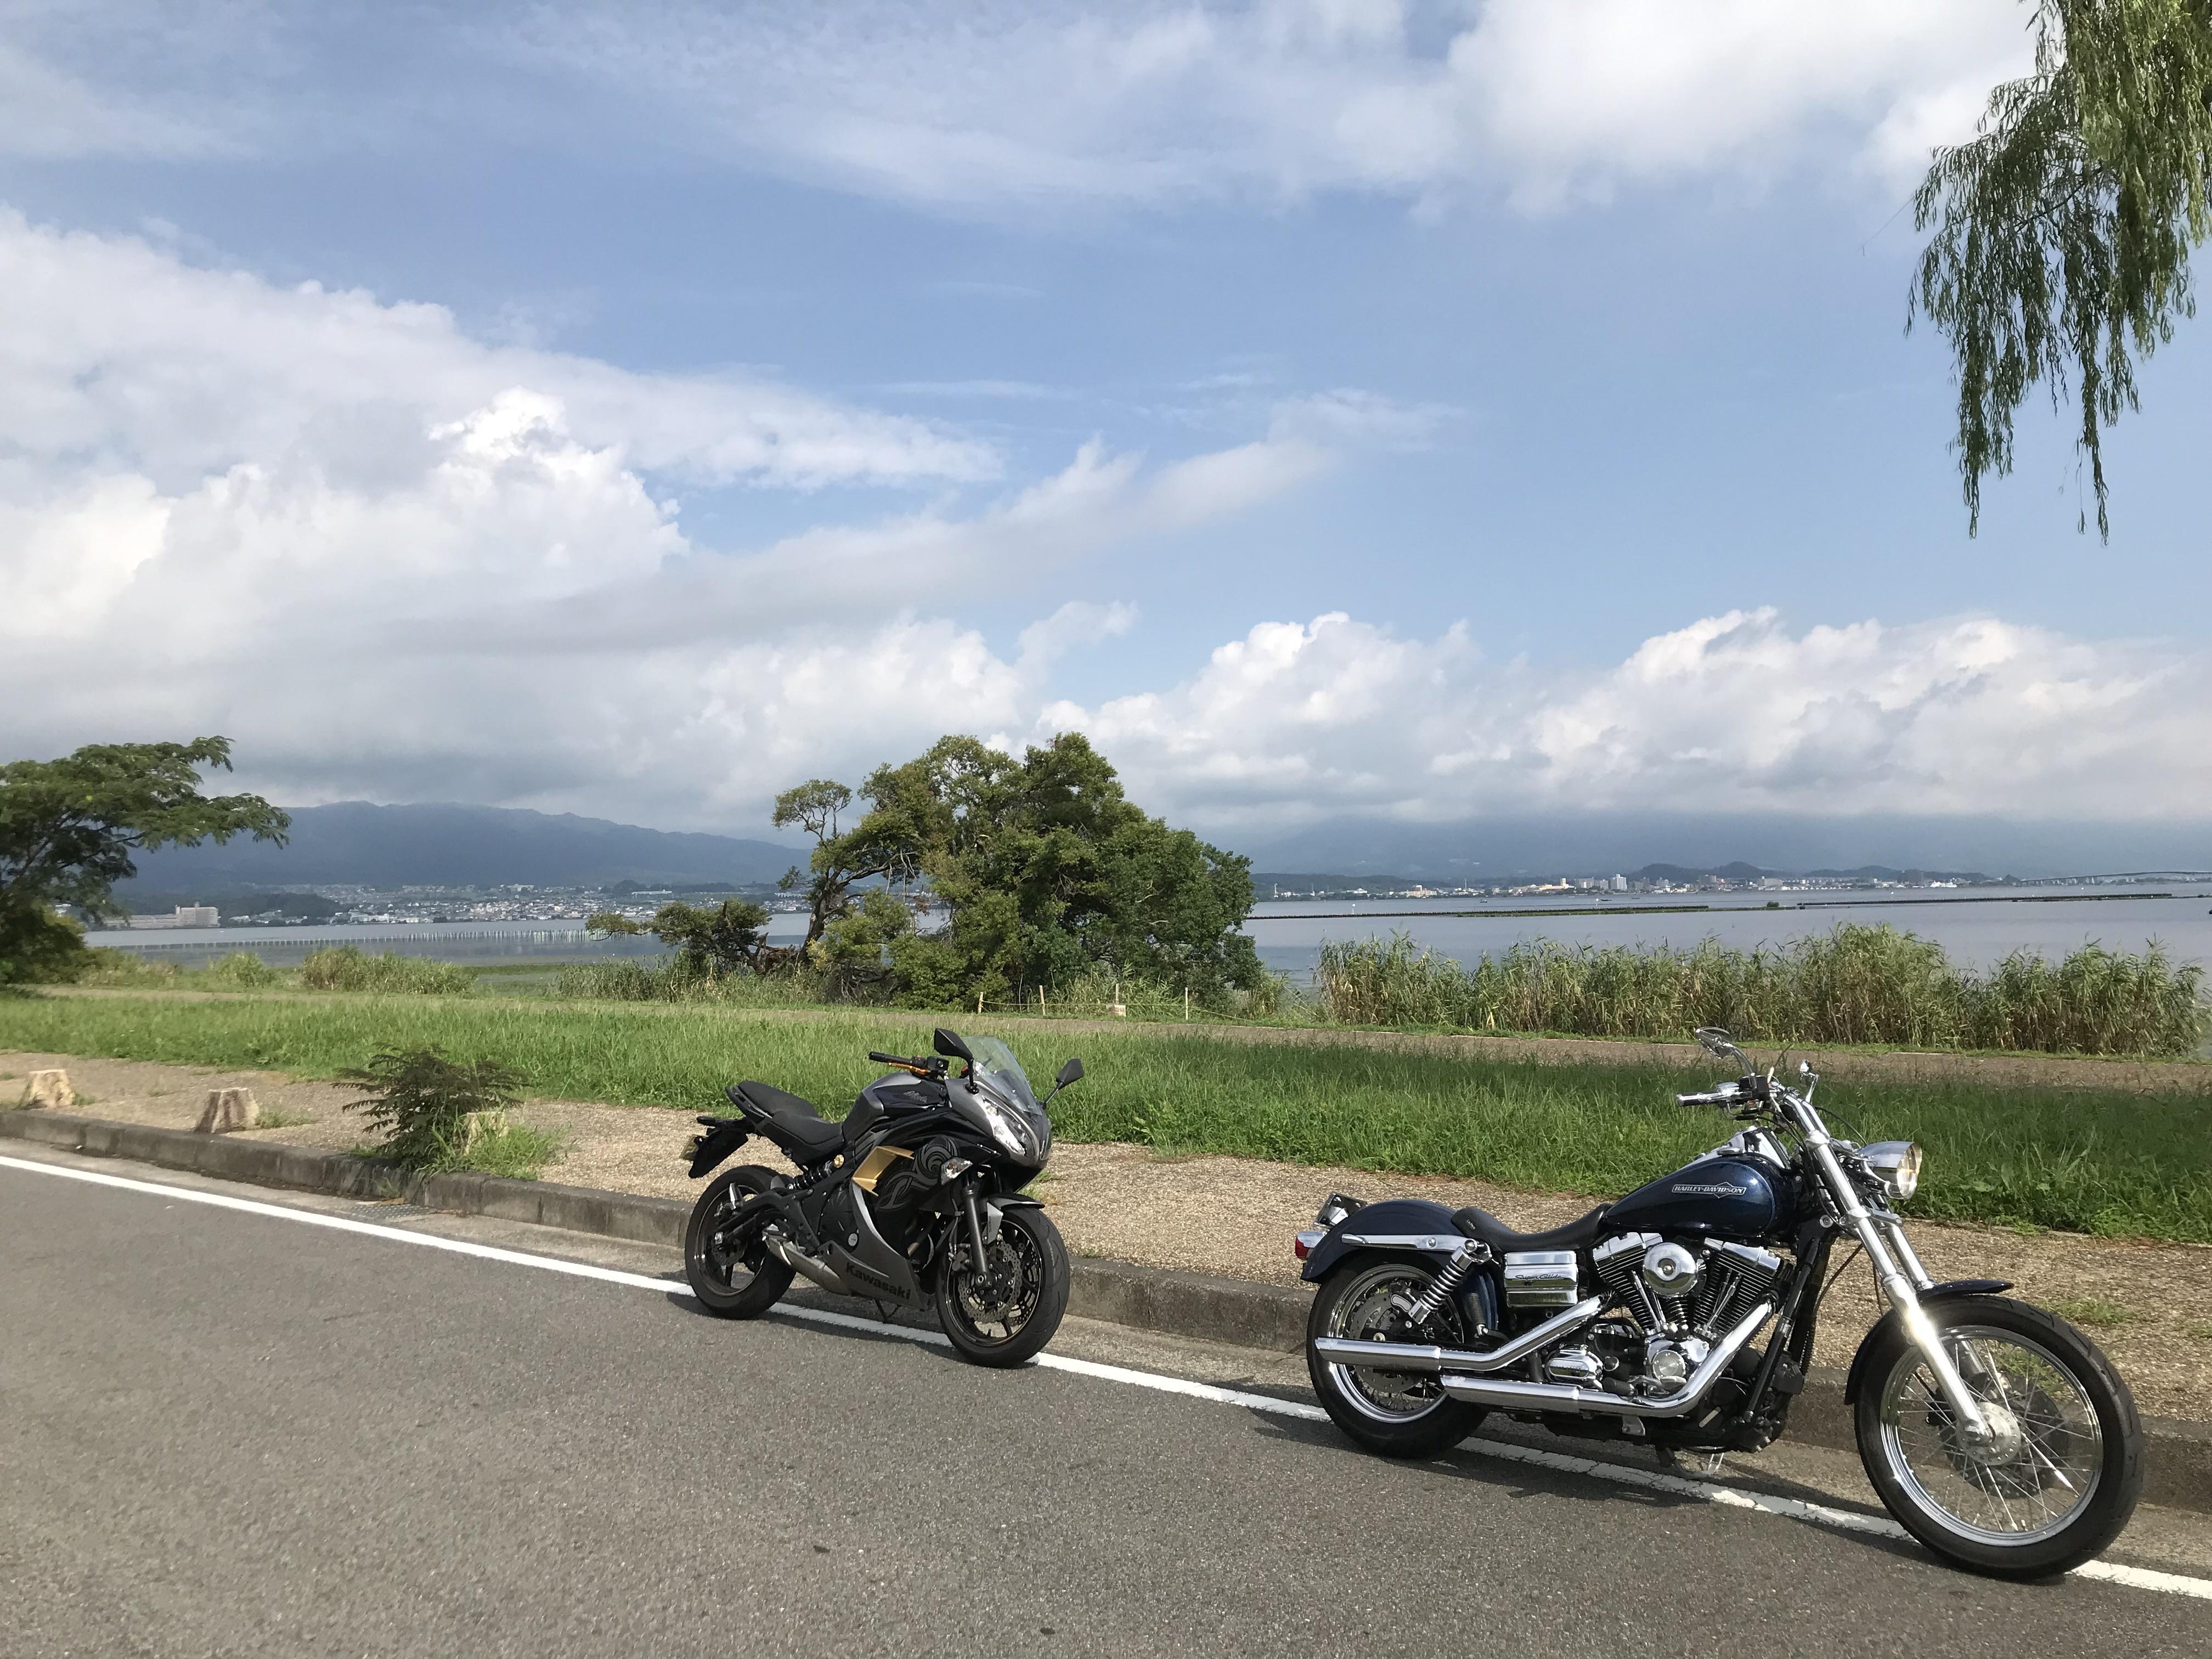 motorcycle-touring-oumihatiman-sazanammi-roadway.jpg